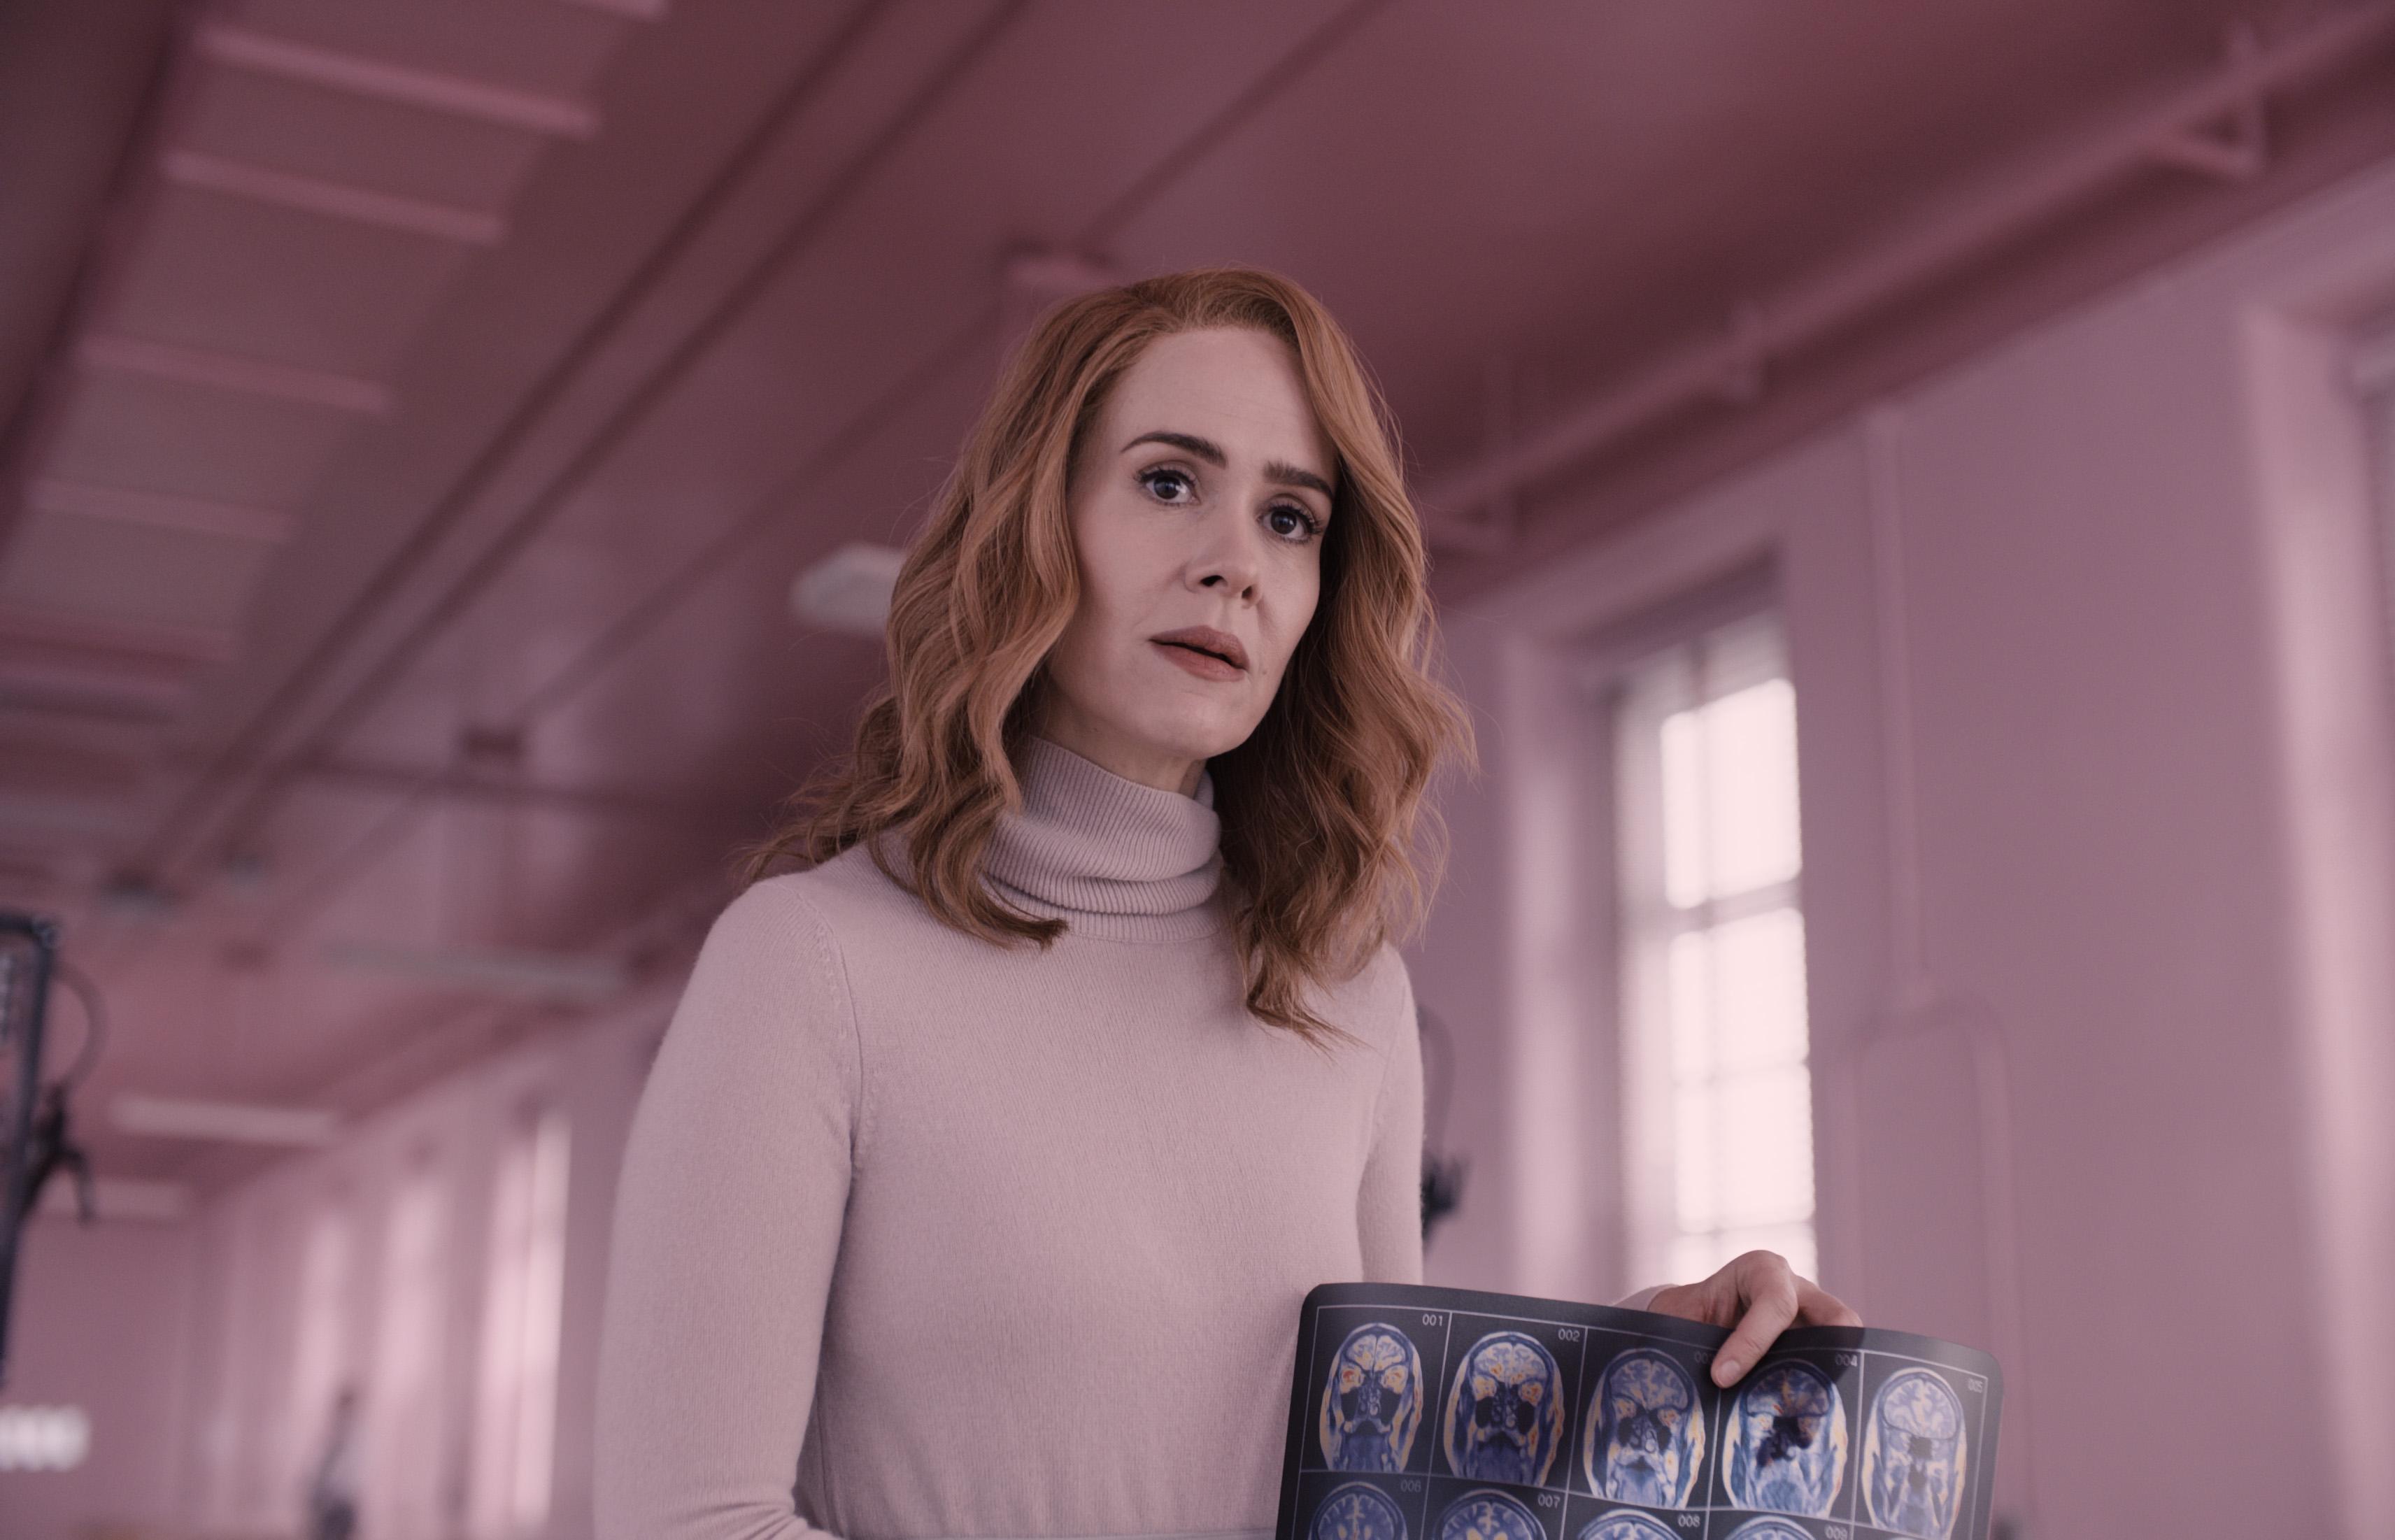 Sarah Paulson as Dr. Ellie Staple in 'Glass' Film